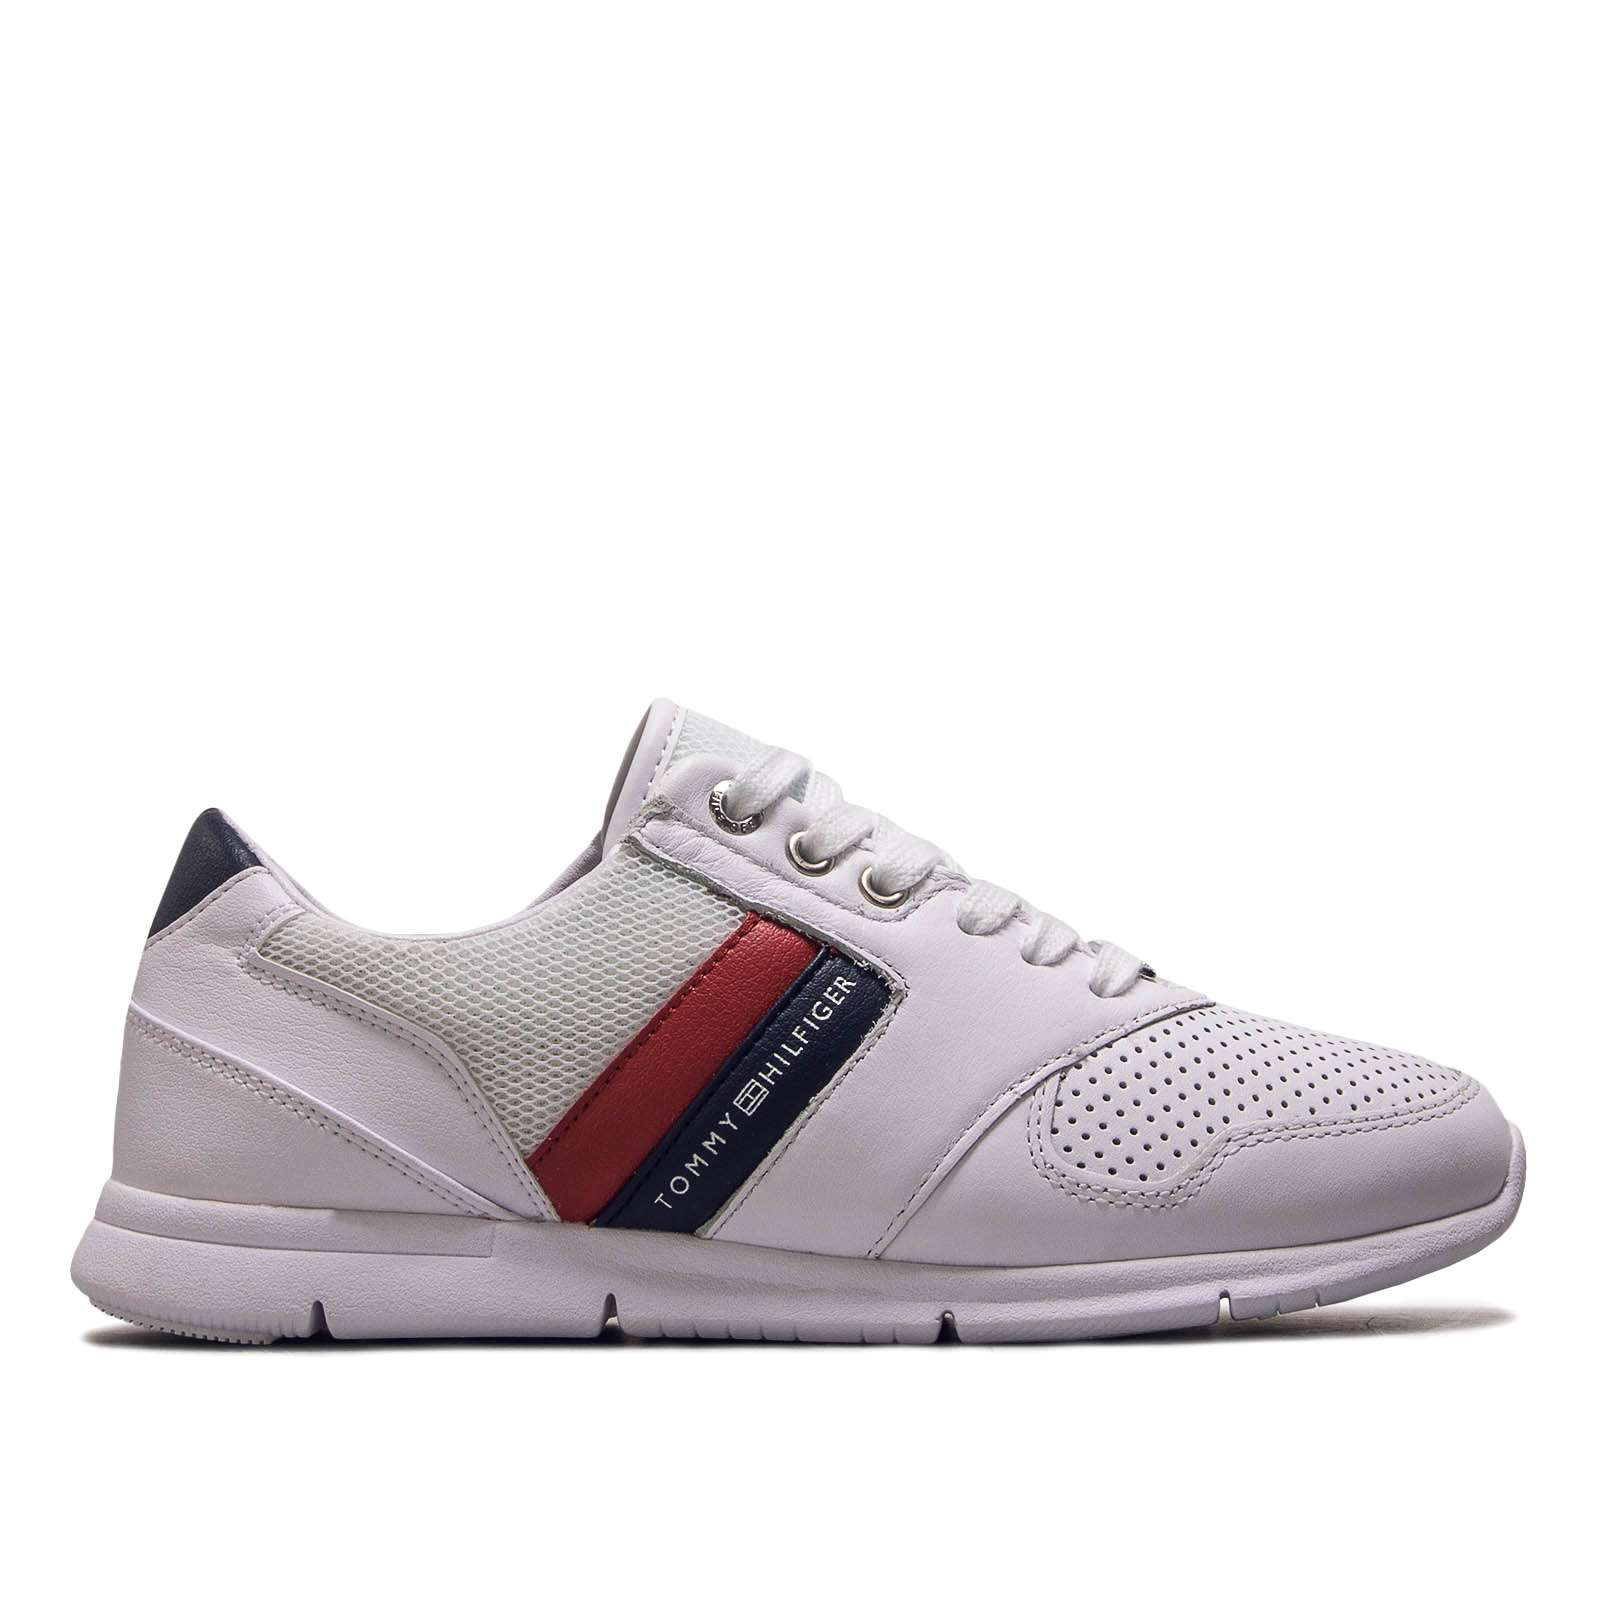 Tommy Hilfiger Damen Sneakers Turnschuhe Fw0fw04261-020 Weiß Neu